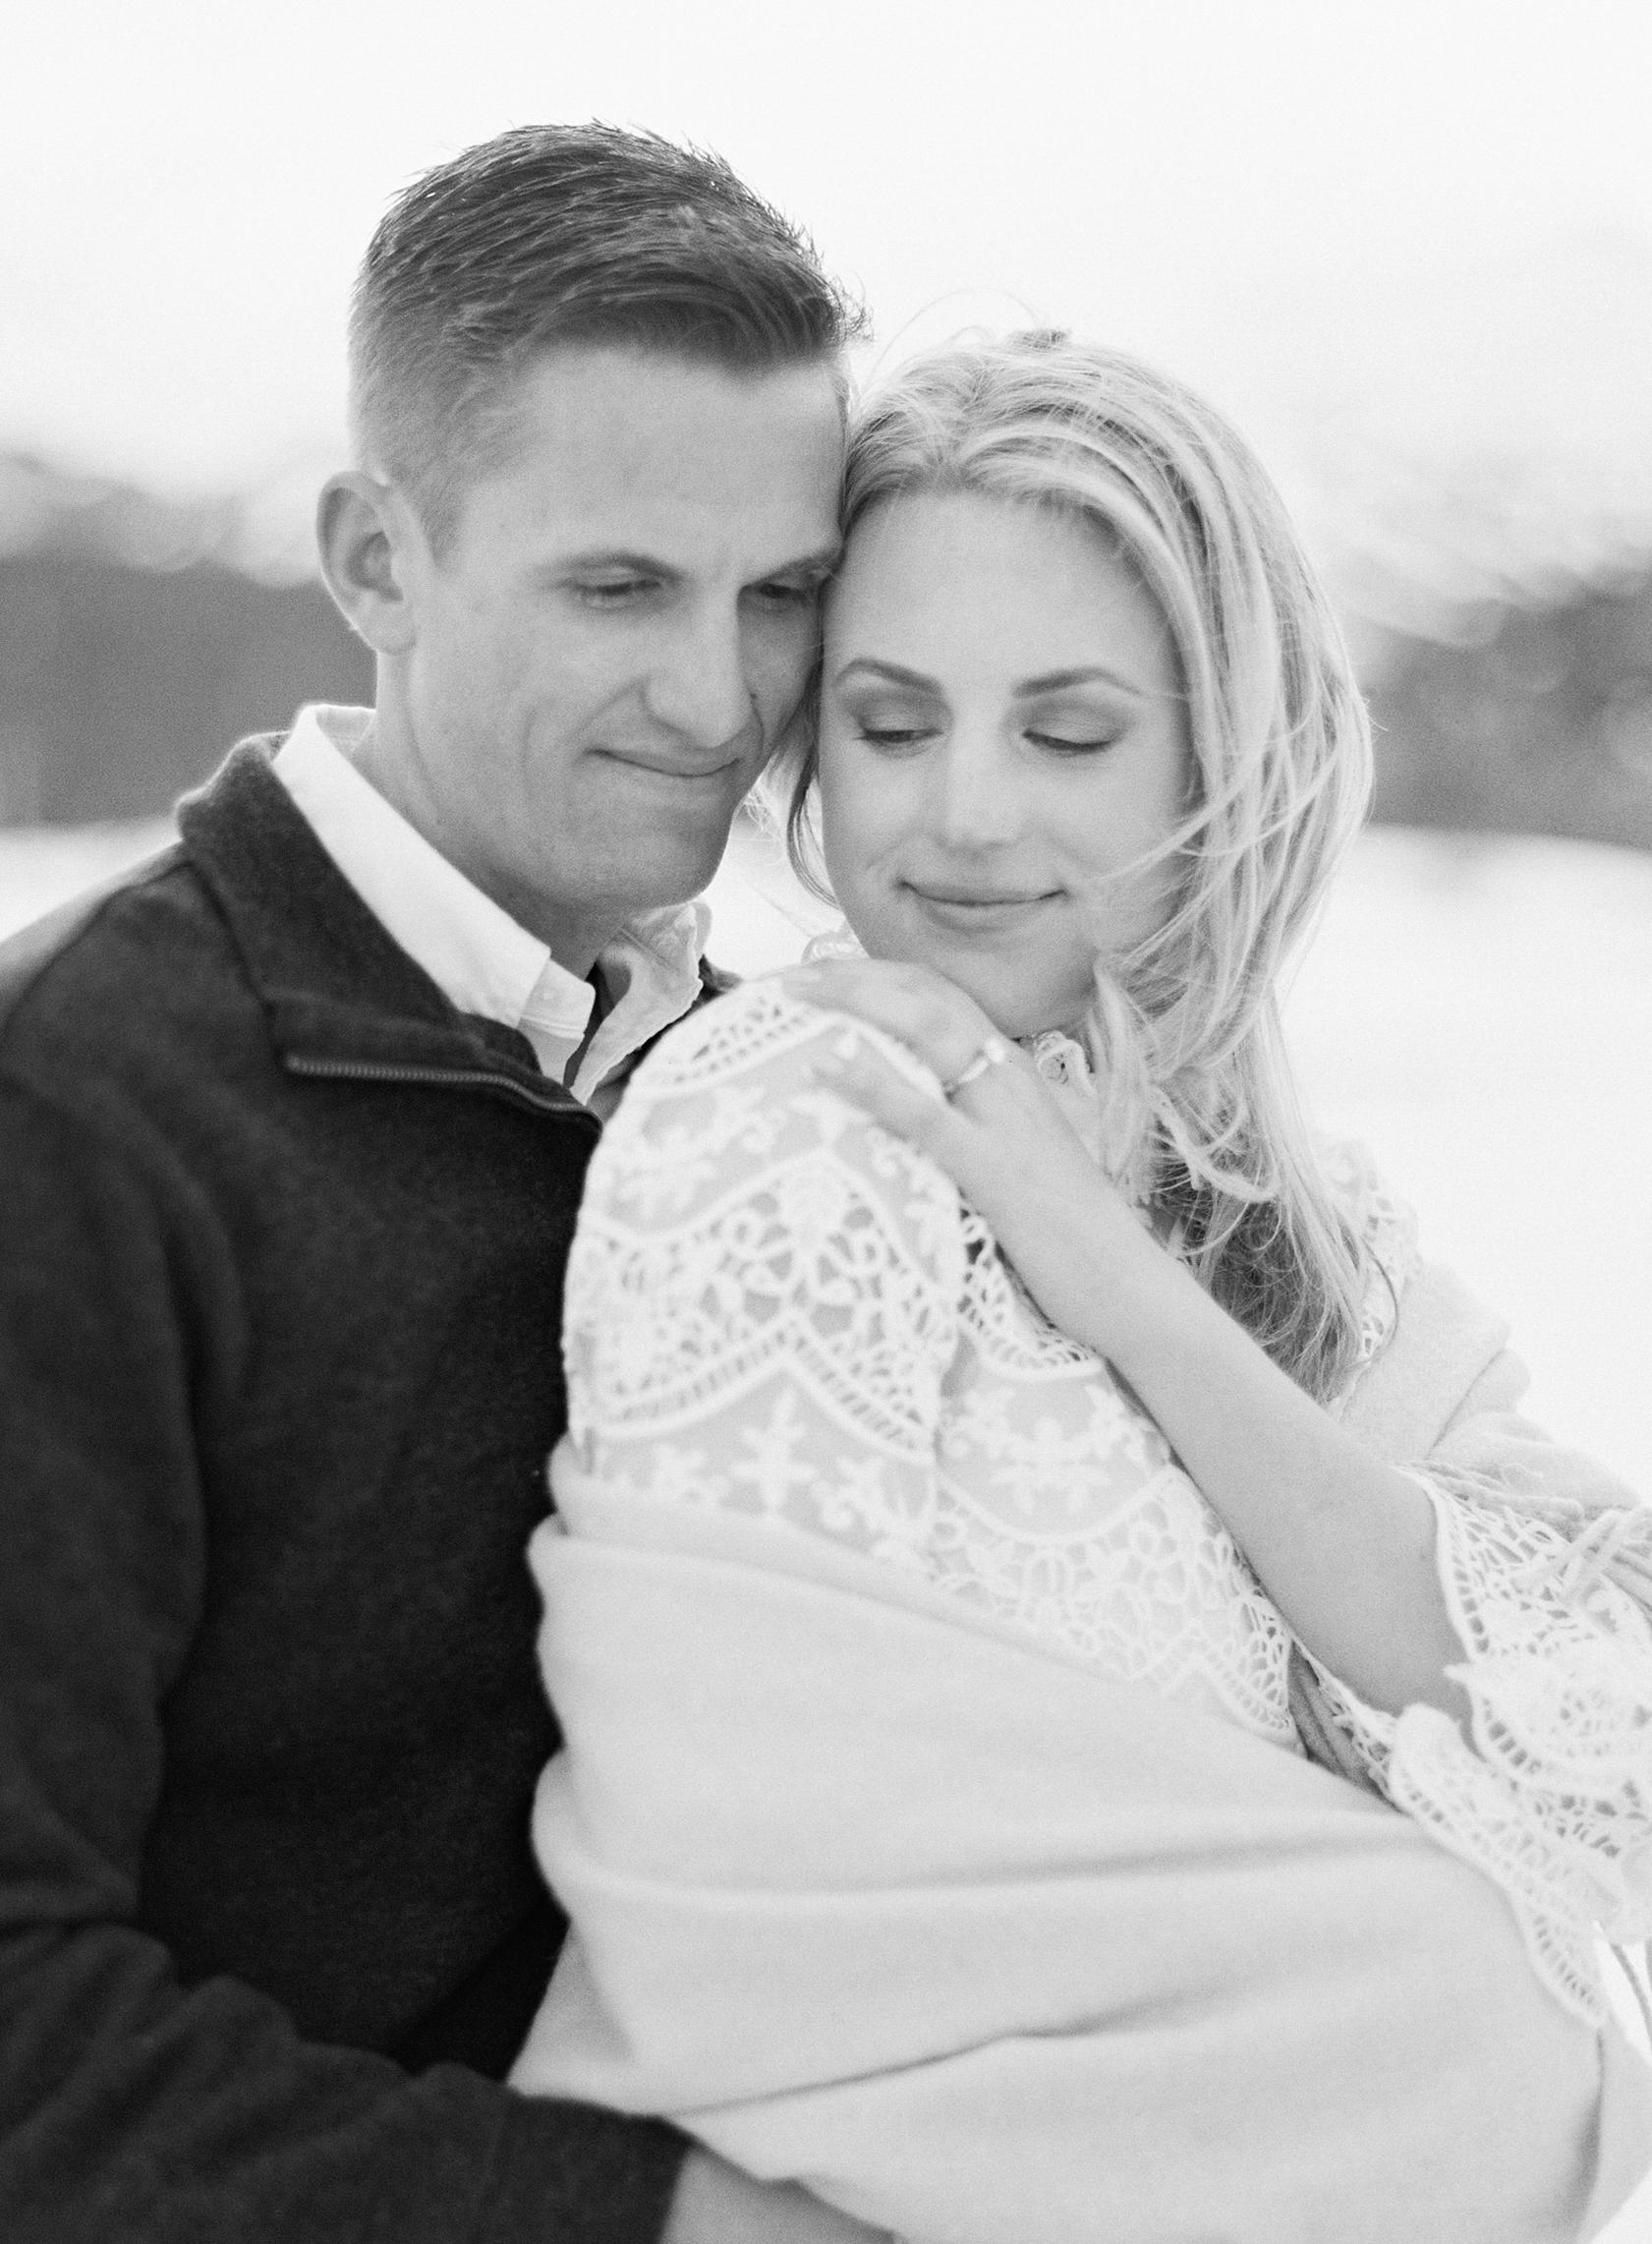 Sarah and John Engaged-Carrie King Photographer88.jpg